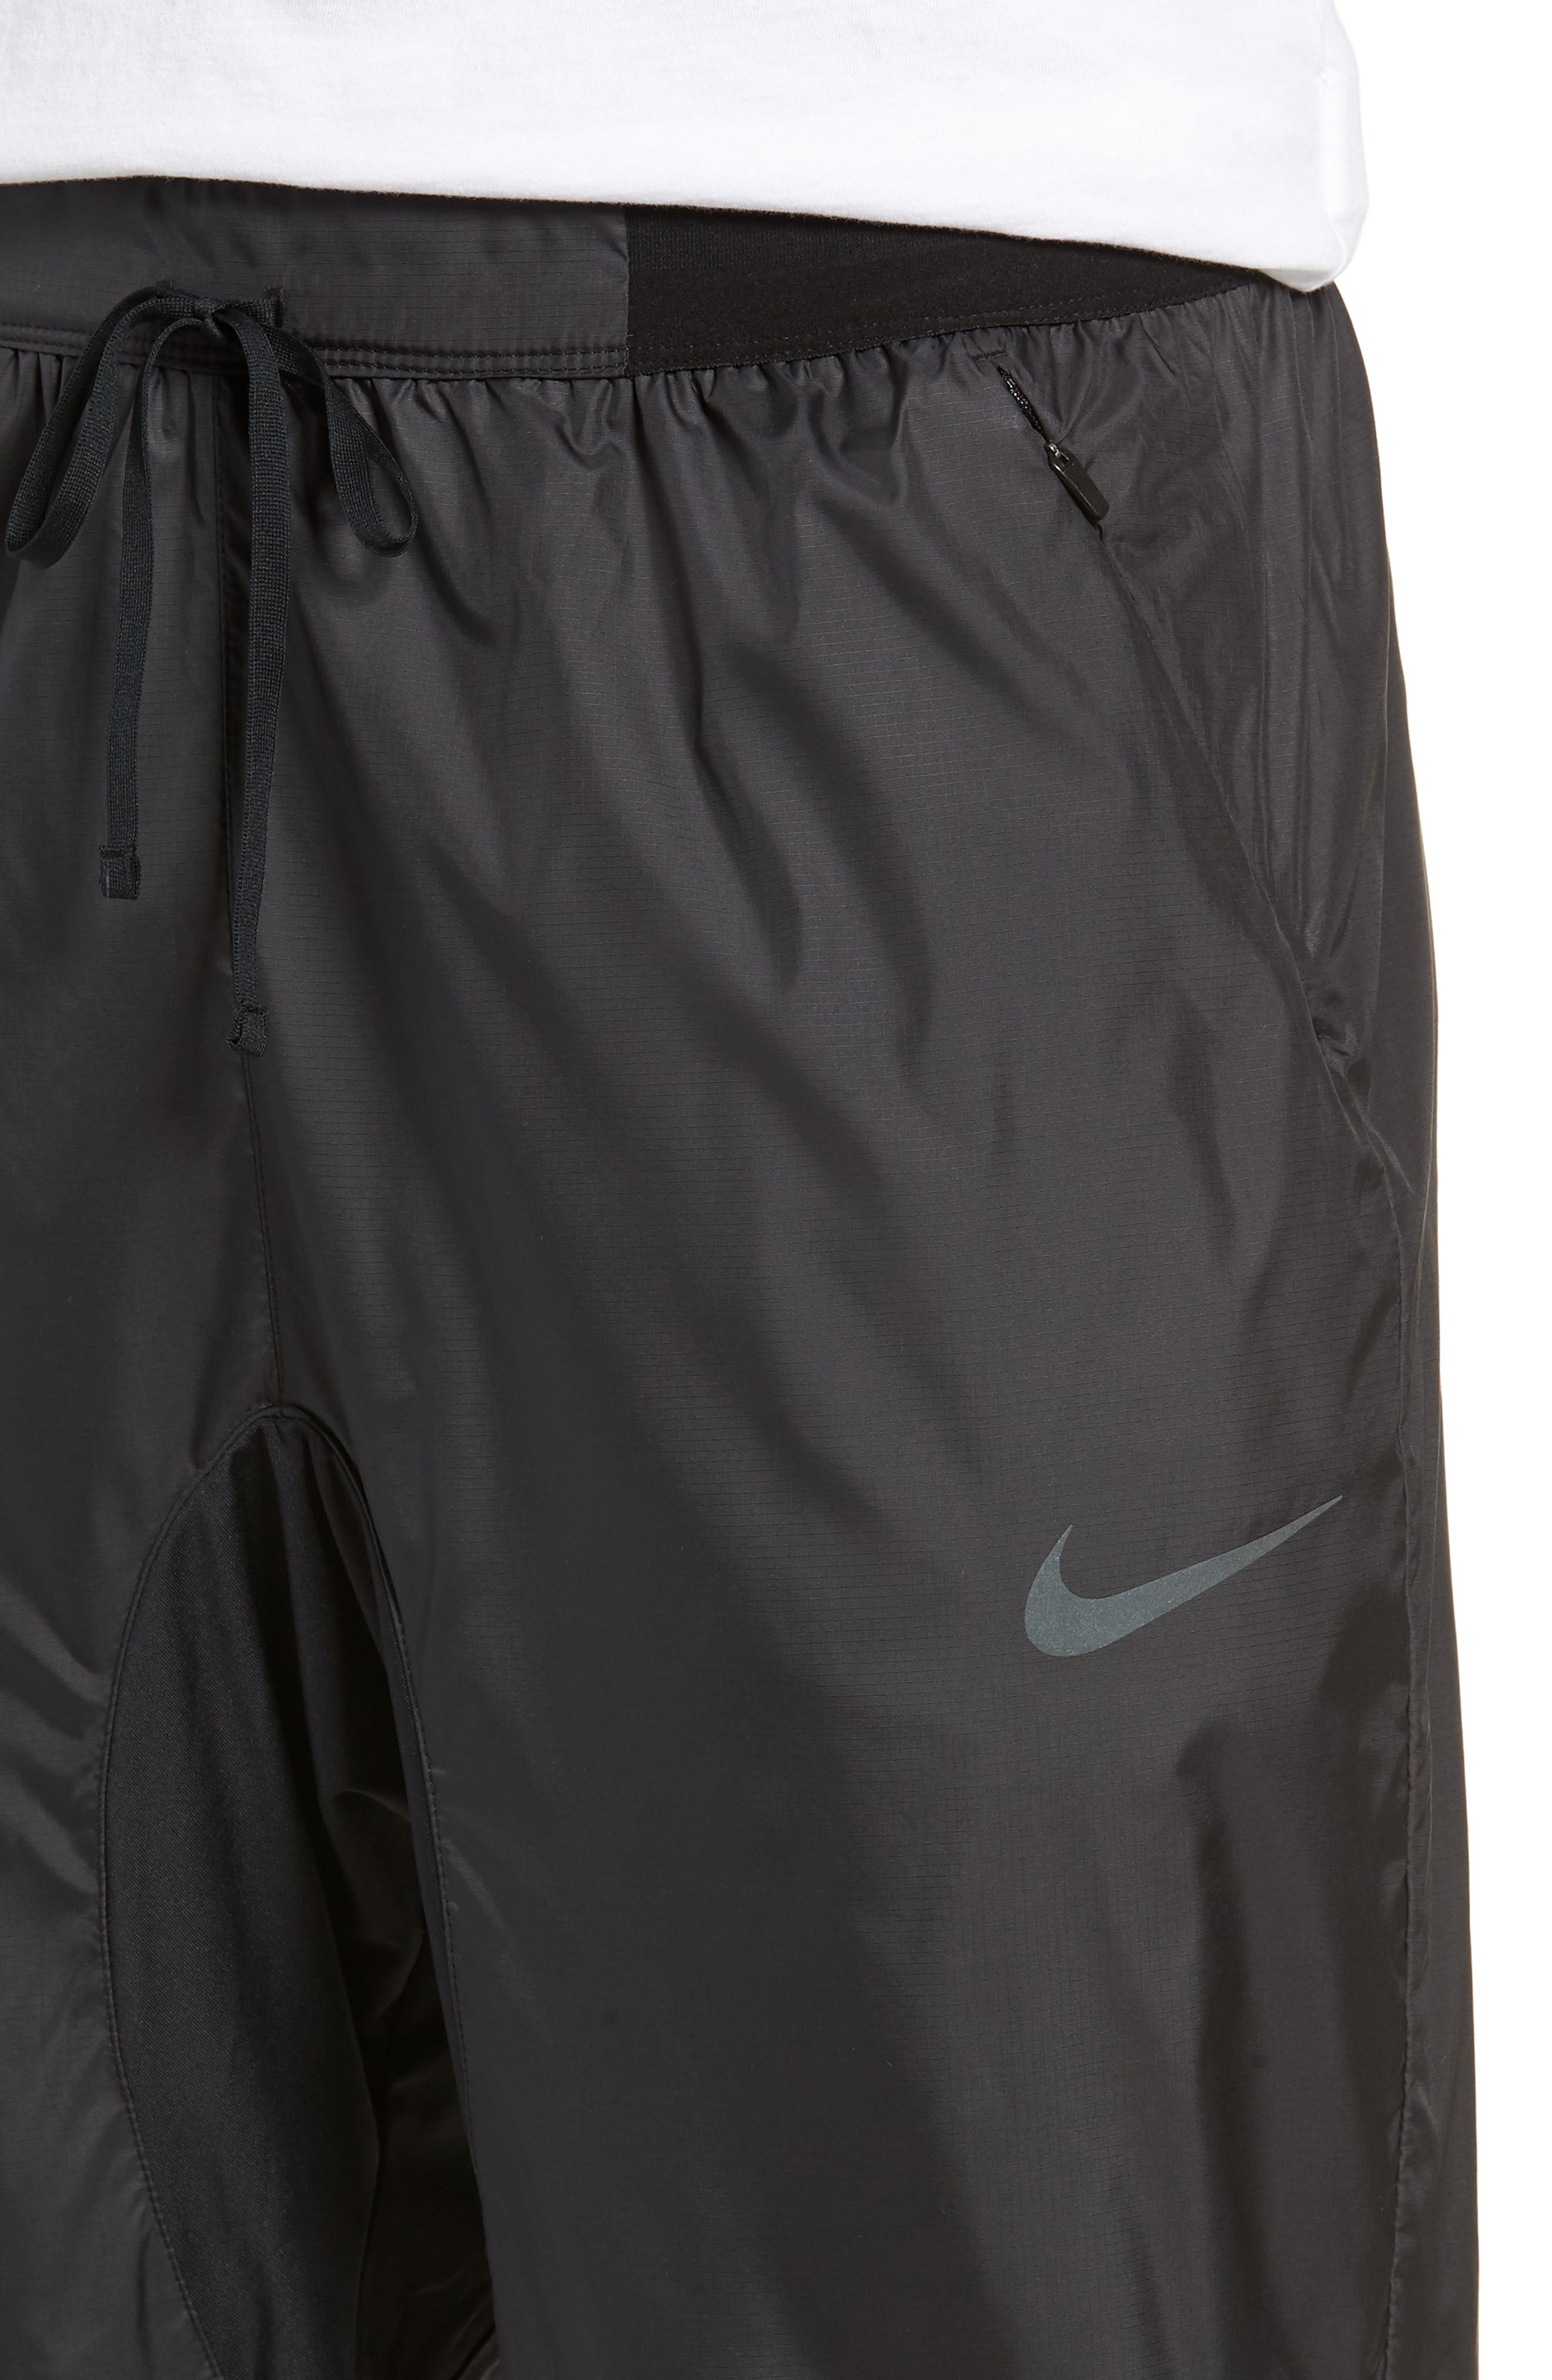 Dry Division Tech Running Pants,                             Alternate thumbnail 4, color,                             BLACK/ BLACK